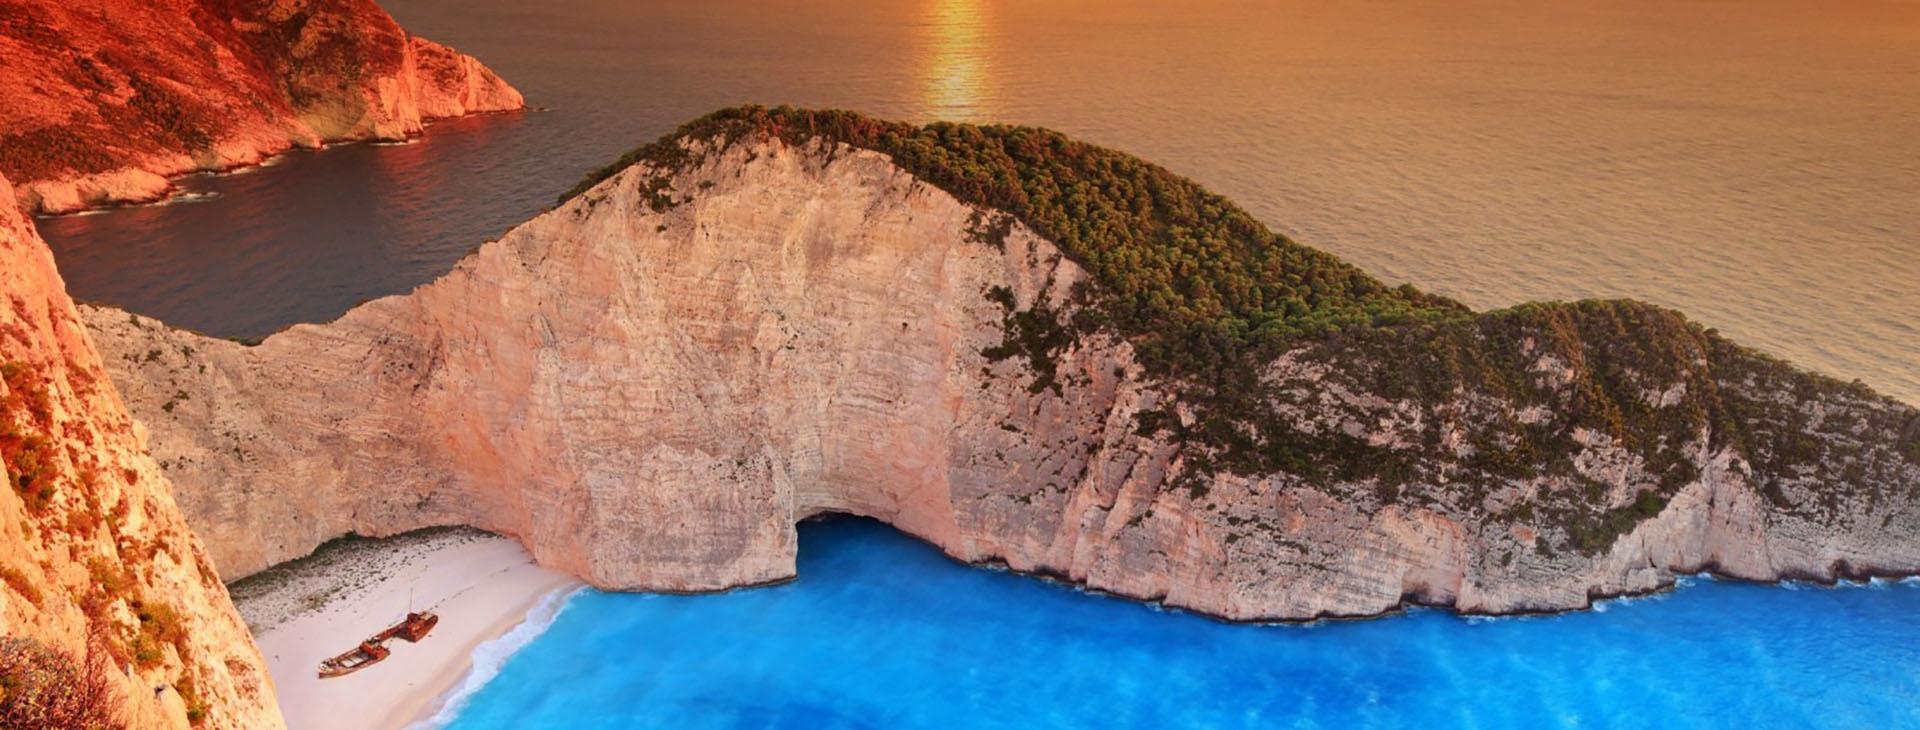 Sunset over Smugglers Cove on Zakynthos island